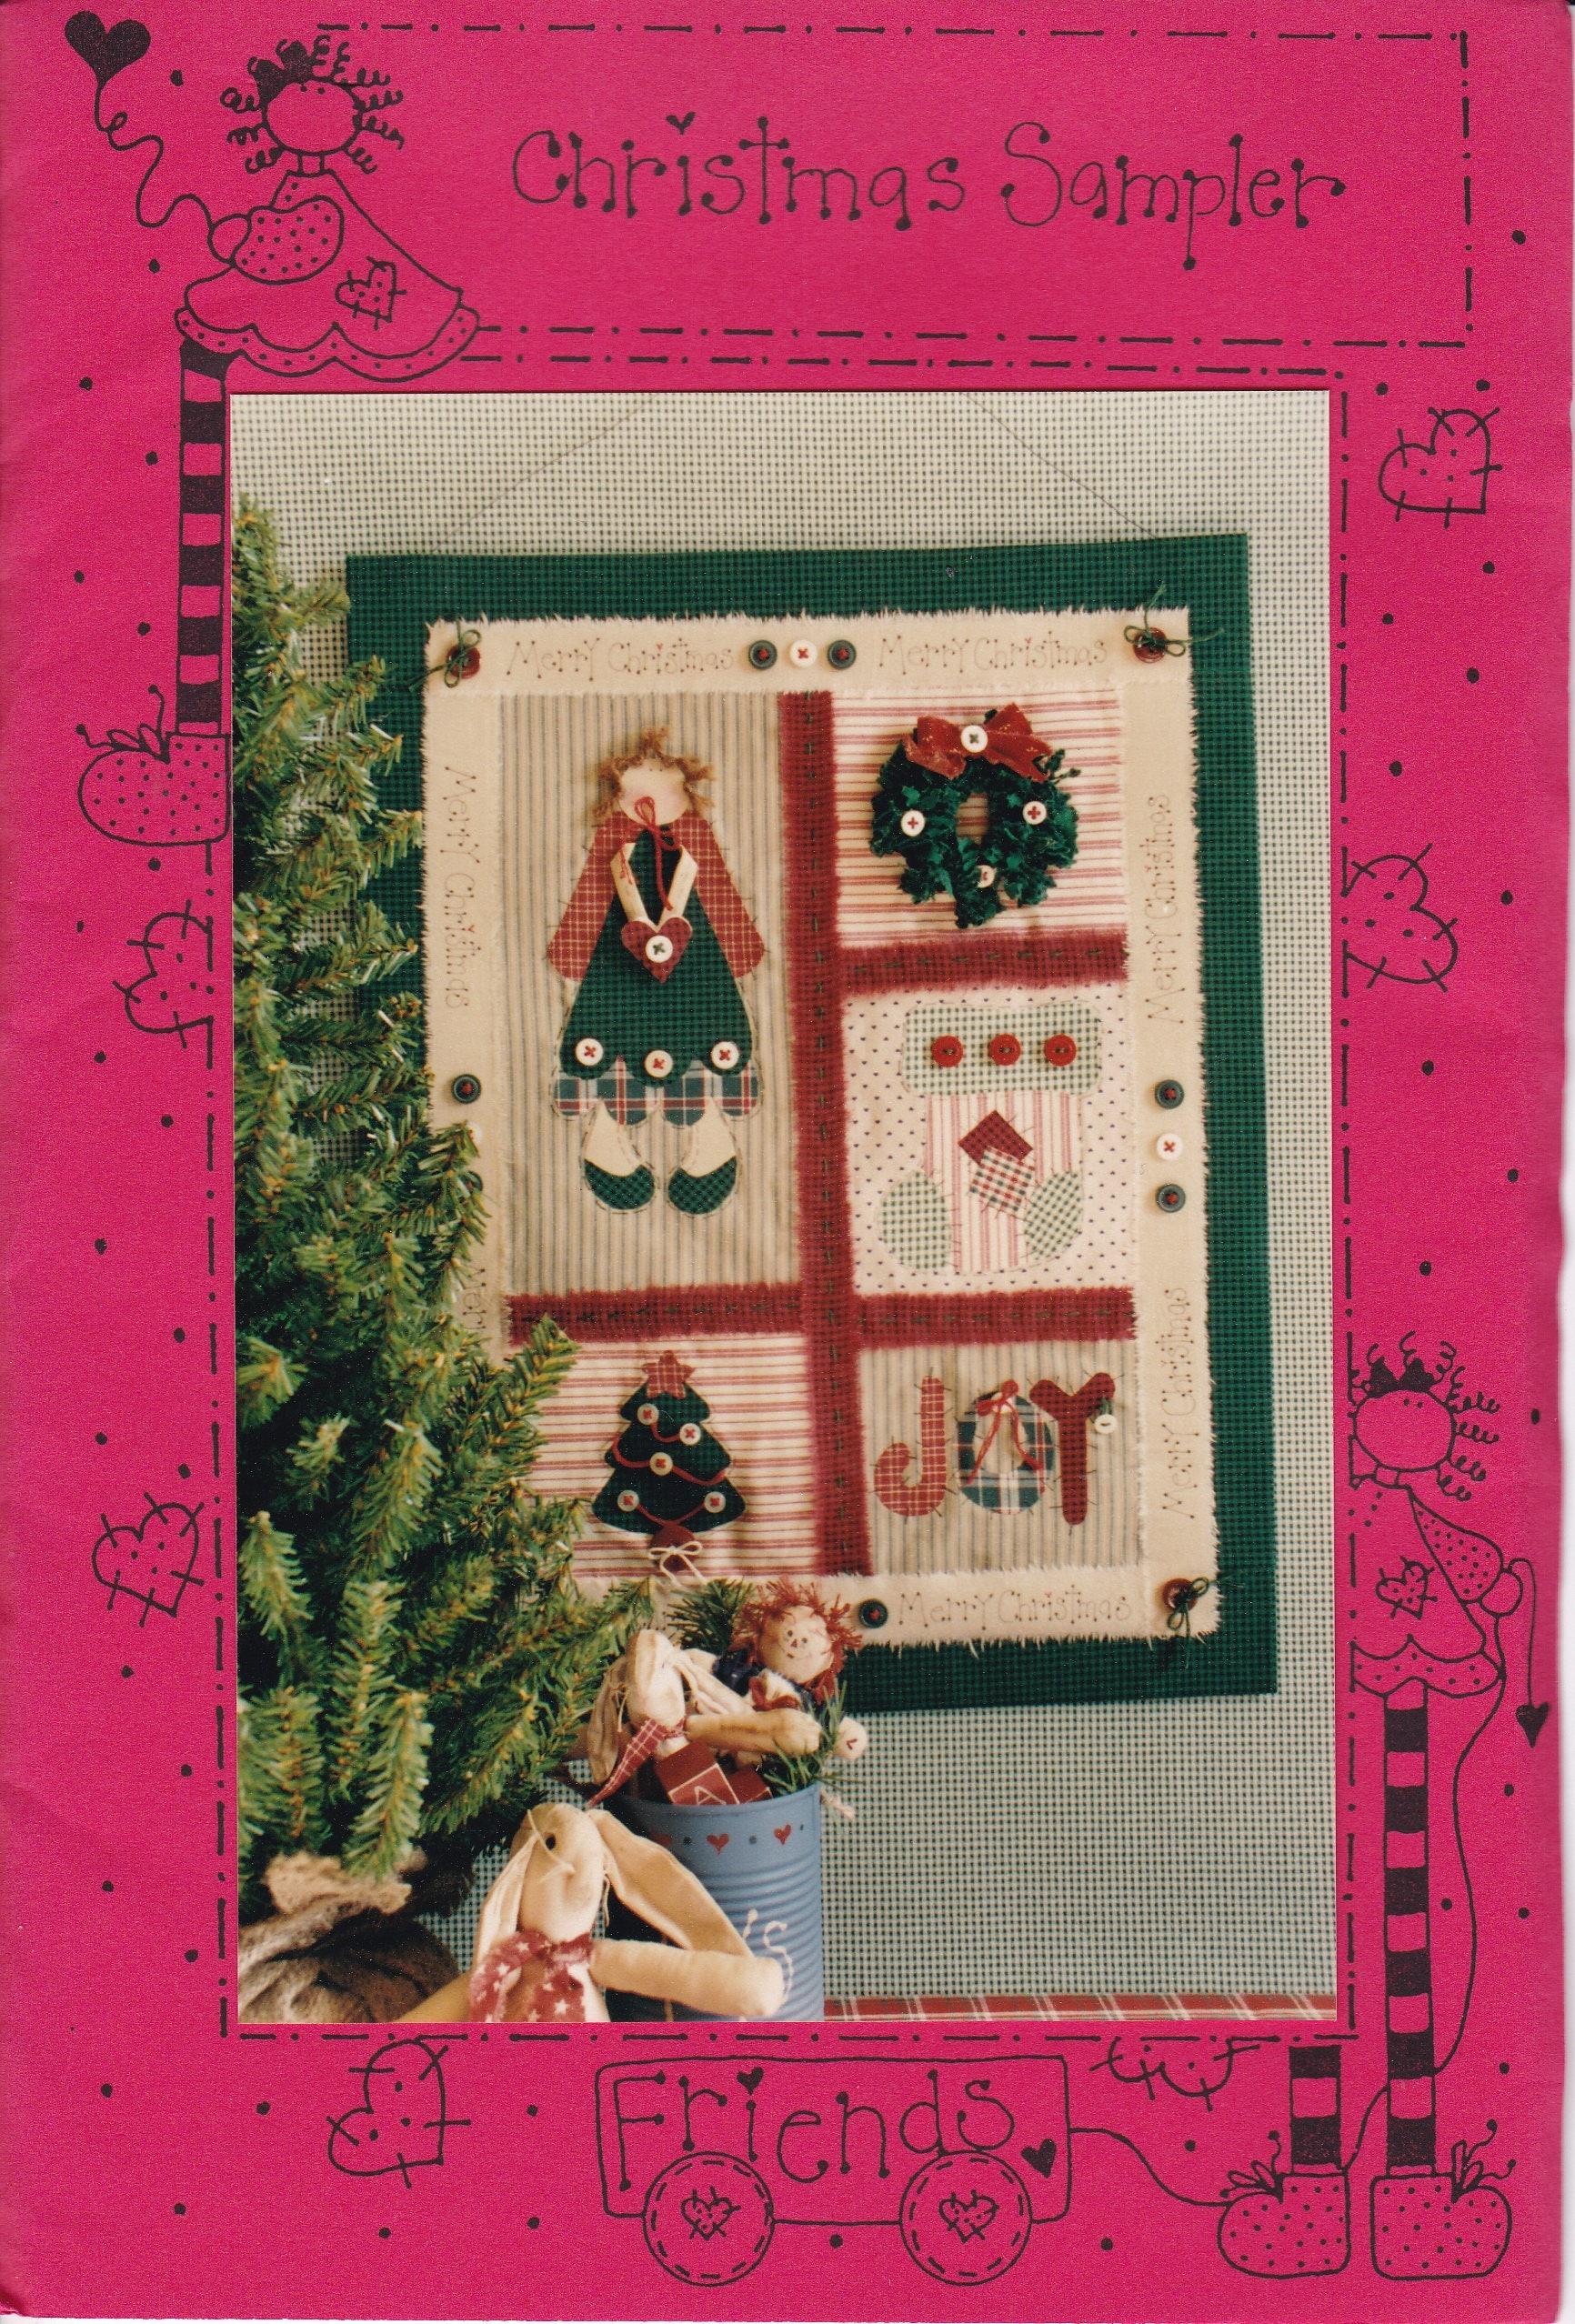 FREE US SHIP Craft Sewing Pattern Christmas Sampler Raggedy Ann ... : raggedy ann quilt pattern - Adamdwight.com